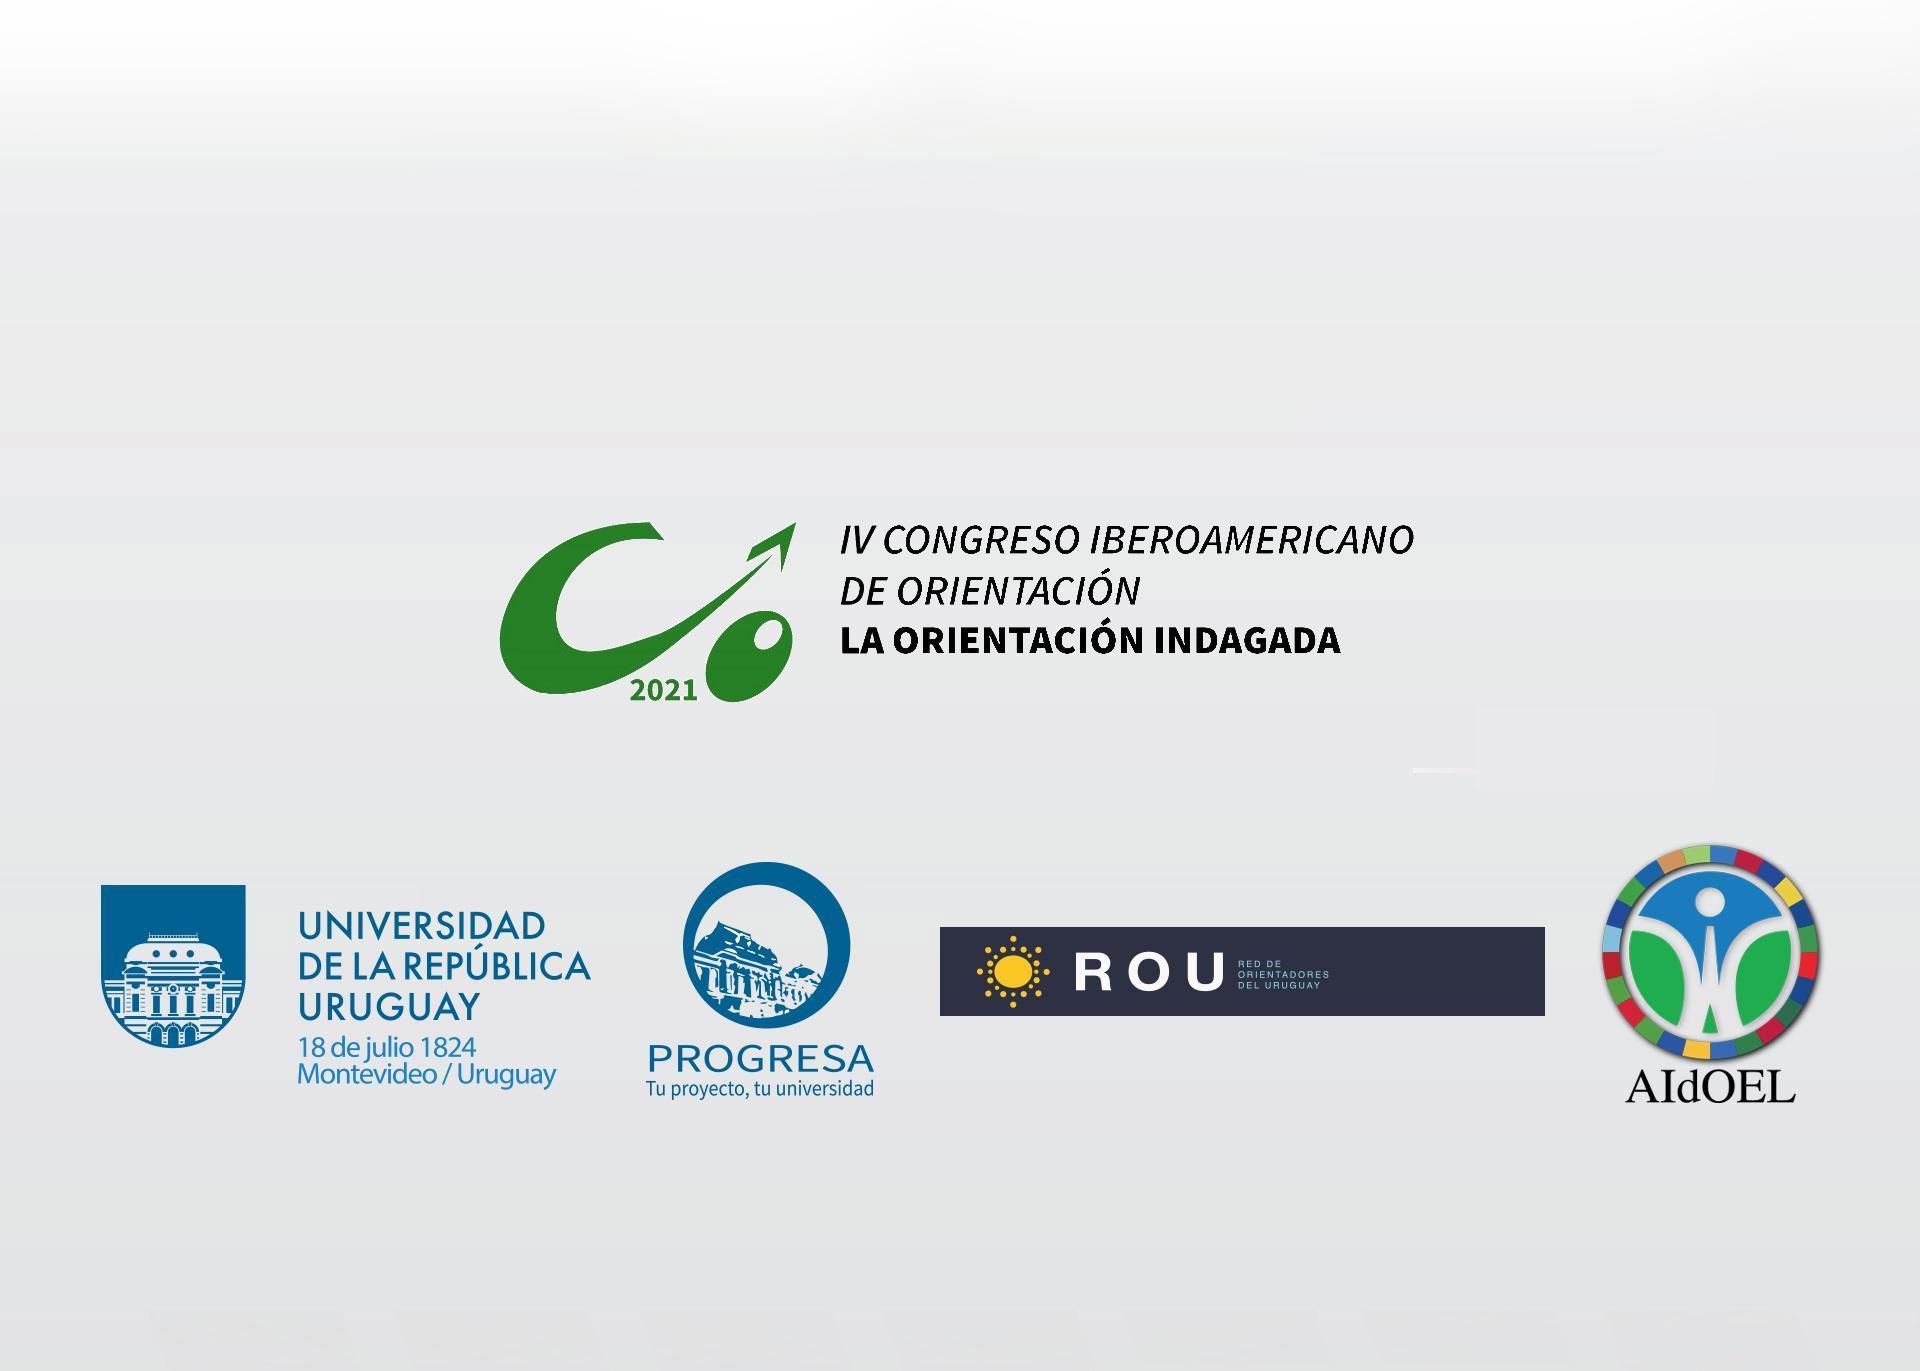 IV Congreso Iberoamericano de orientación.